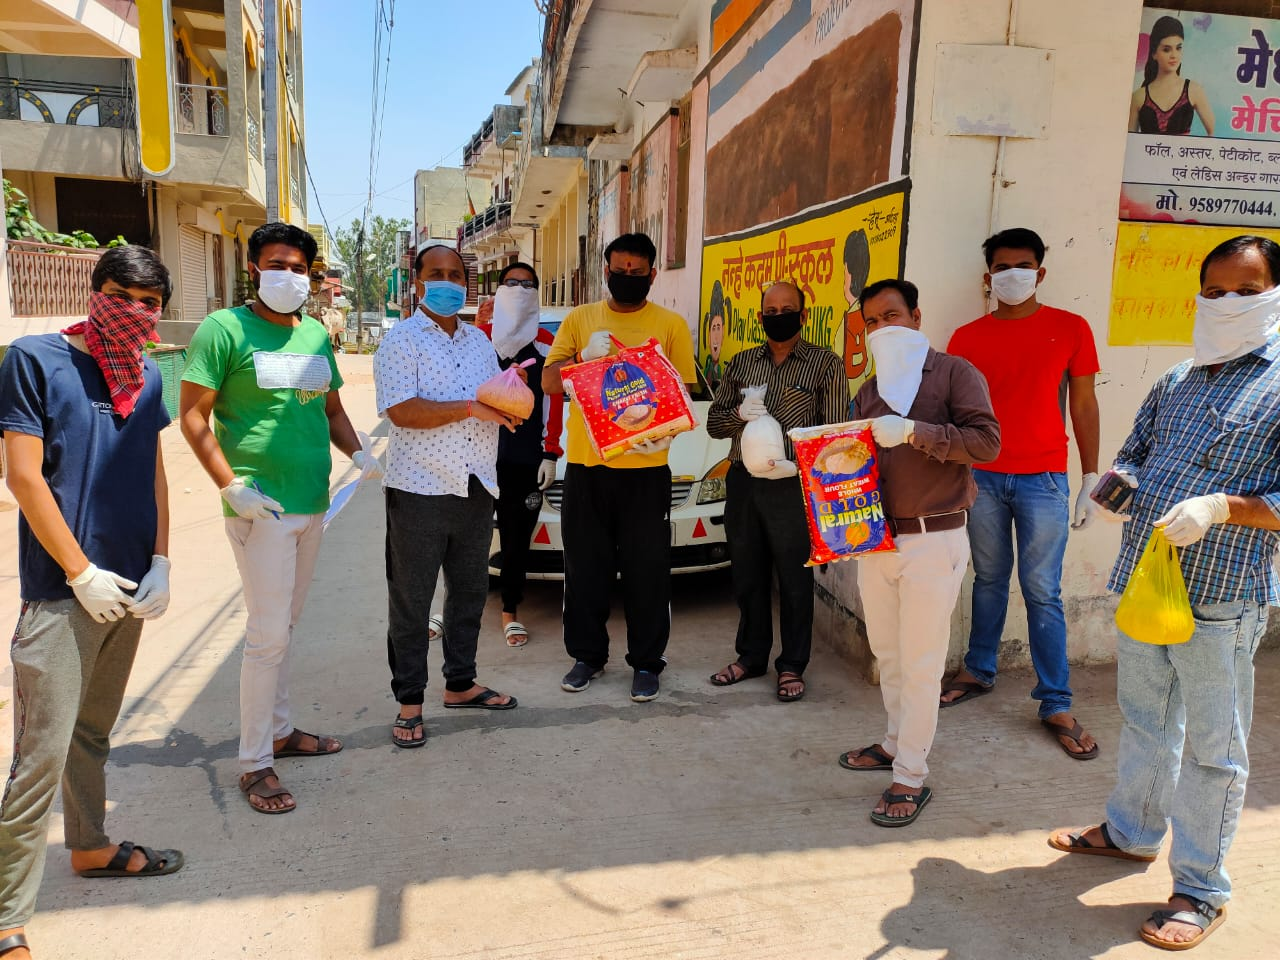 Jhabua News- भाजपा कार्यकर्ता द्वारा खाद्य सामग्री एकत्रित कर जरुरतमंदो तक पहुंचाई जा रही